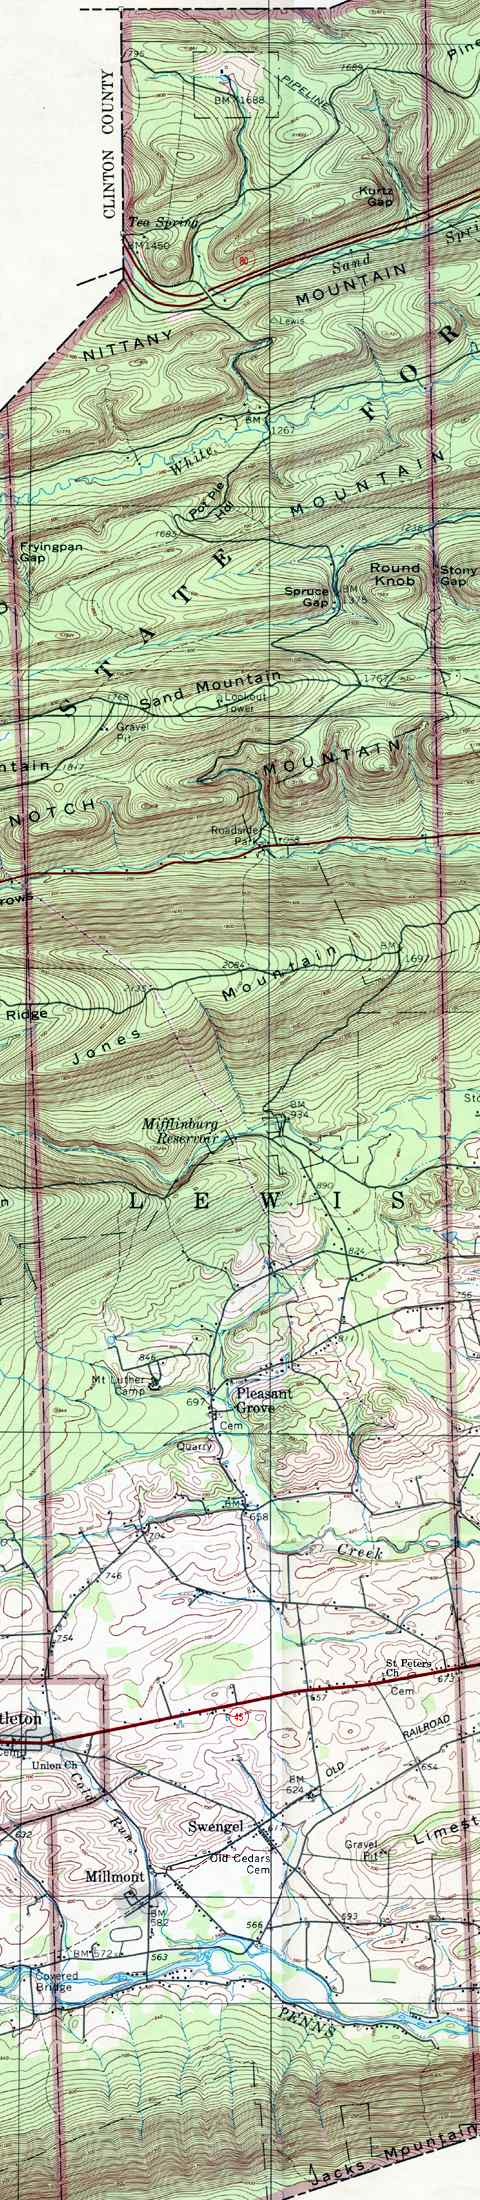 Union County Pennsylvania Township Maps on map of preble county, map of du page county, map of gilmer county, map of yazoo county, map of juniata county, map of woodford county, map of white county, map of greenwood county, map of banks county, map of clarke county, map of alexander county, map of glades county, map of iron county, map of saint clair county, map of roane county, map of crittenden county, map of stone county, map of essex county, map of rockbridge county, map of noble county,